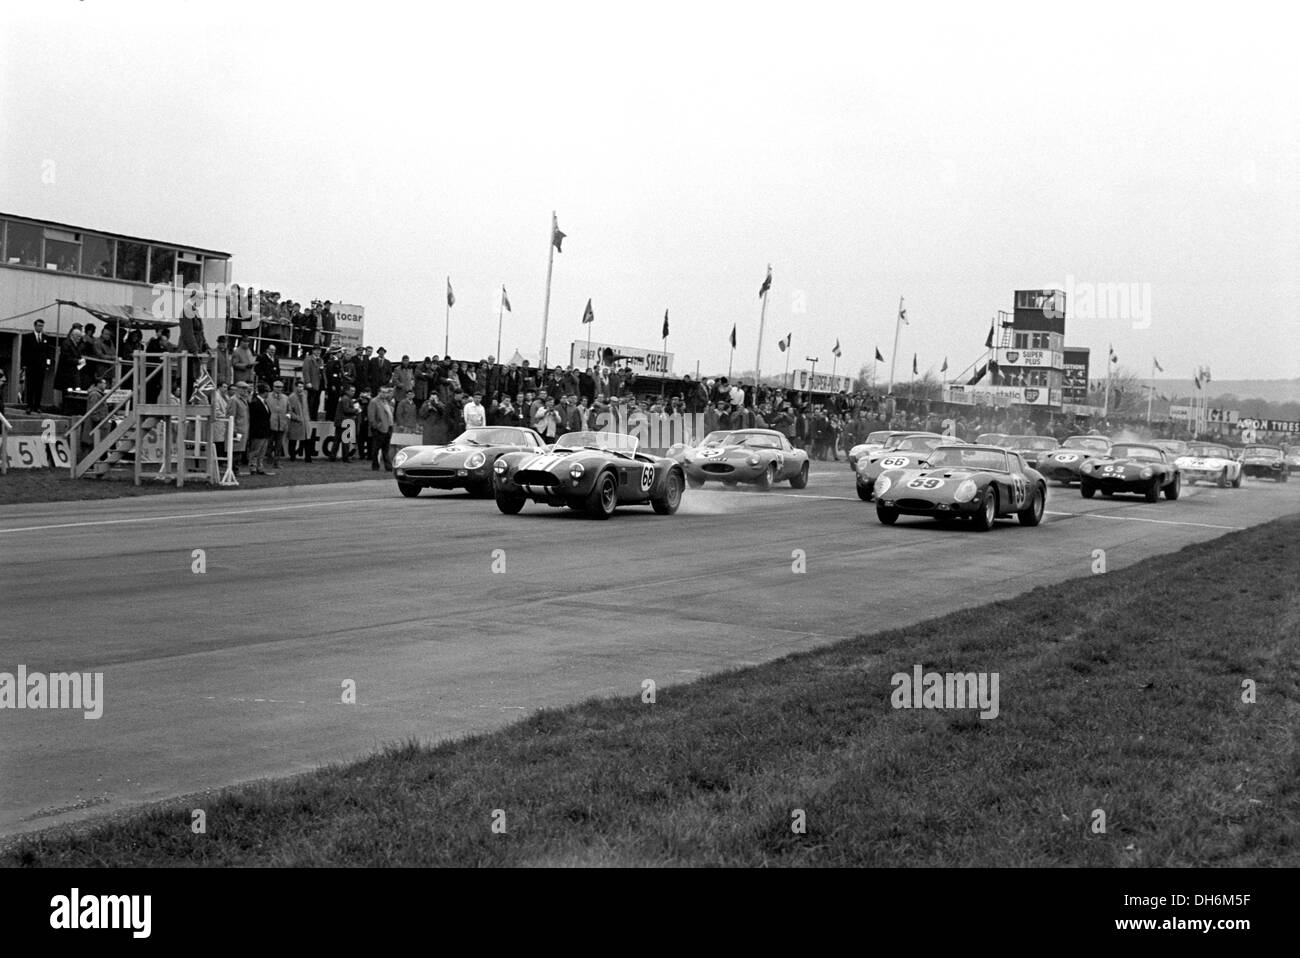 Start RAC Tourist Trophy. No9 Frank Gardner's Elva Mk 7S BMW, No5 John Coundley-Ian Raby - Lotus 19 Climax, Goodwood, 1964. - Stock Image